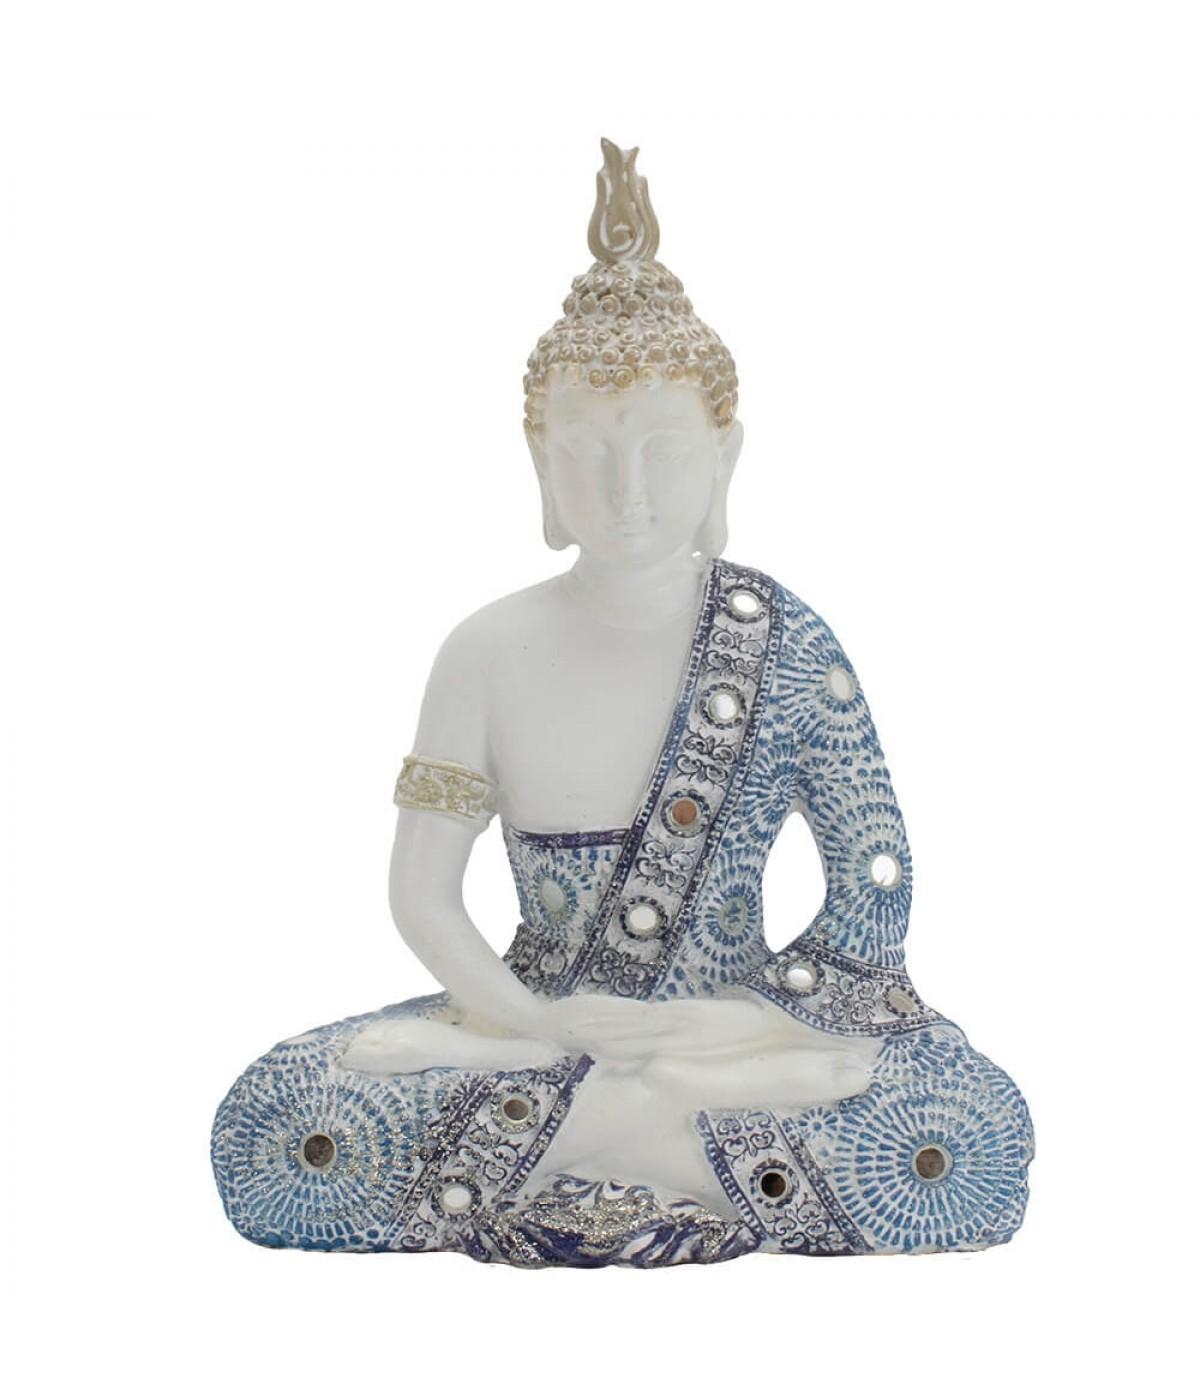 Buda Branco Em Posição Dhyani Mudra 19,5cm